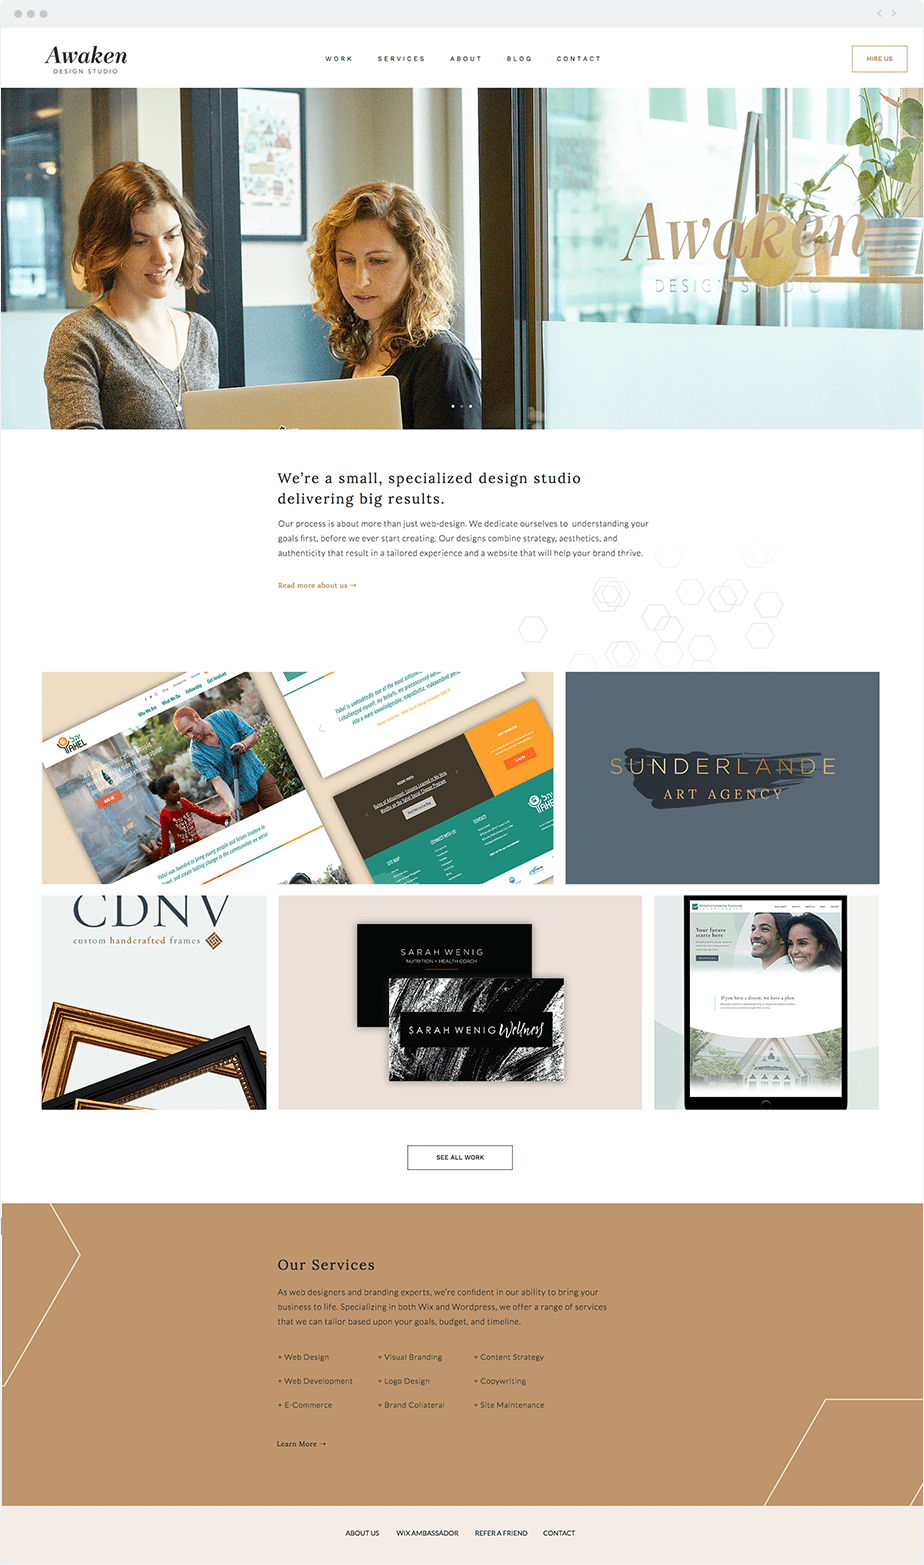 Professionals who use Wix: Awaken design studio